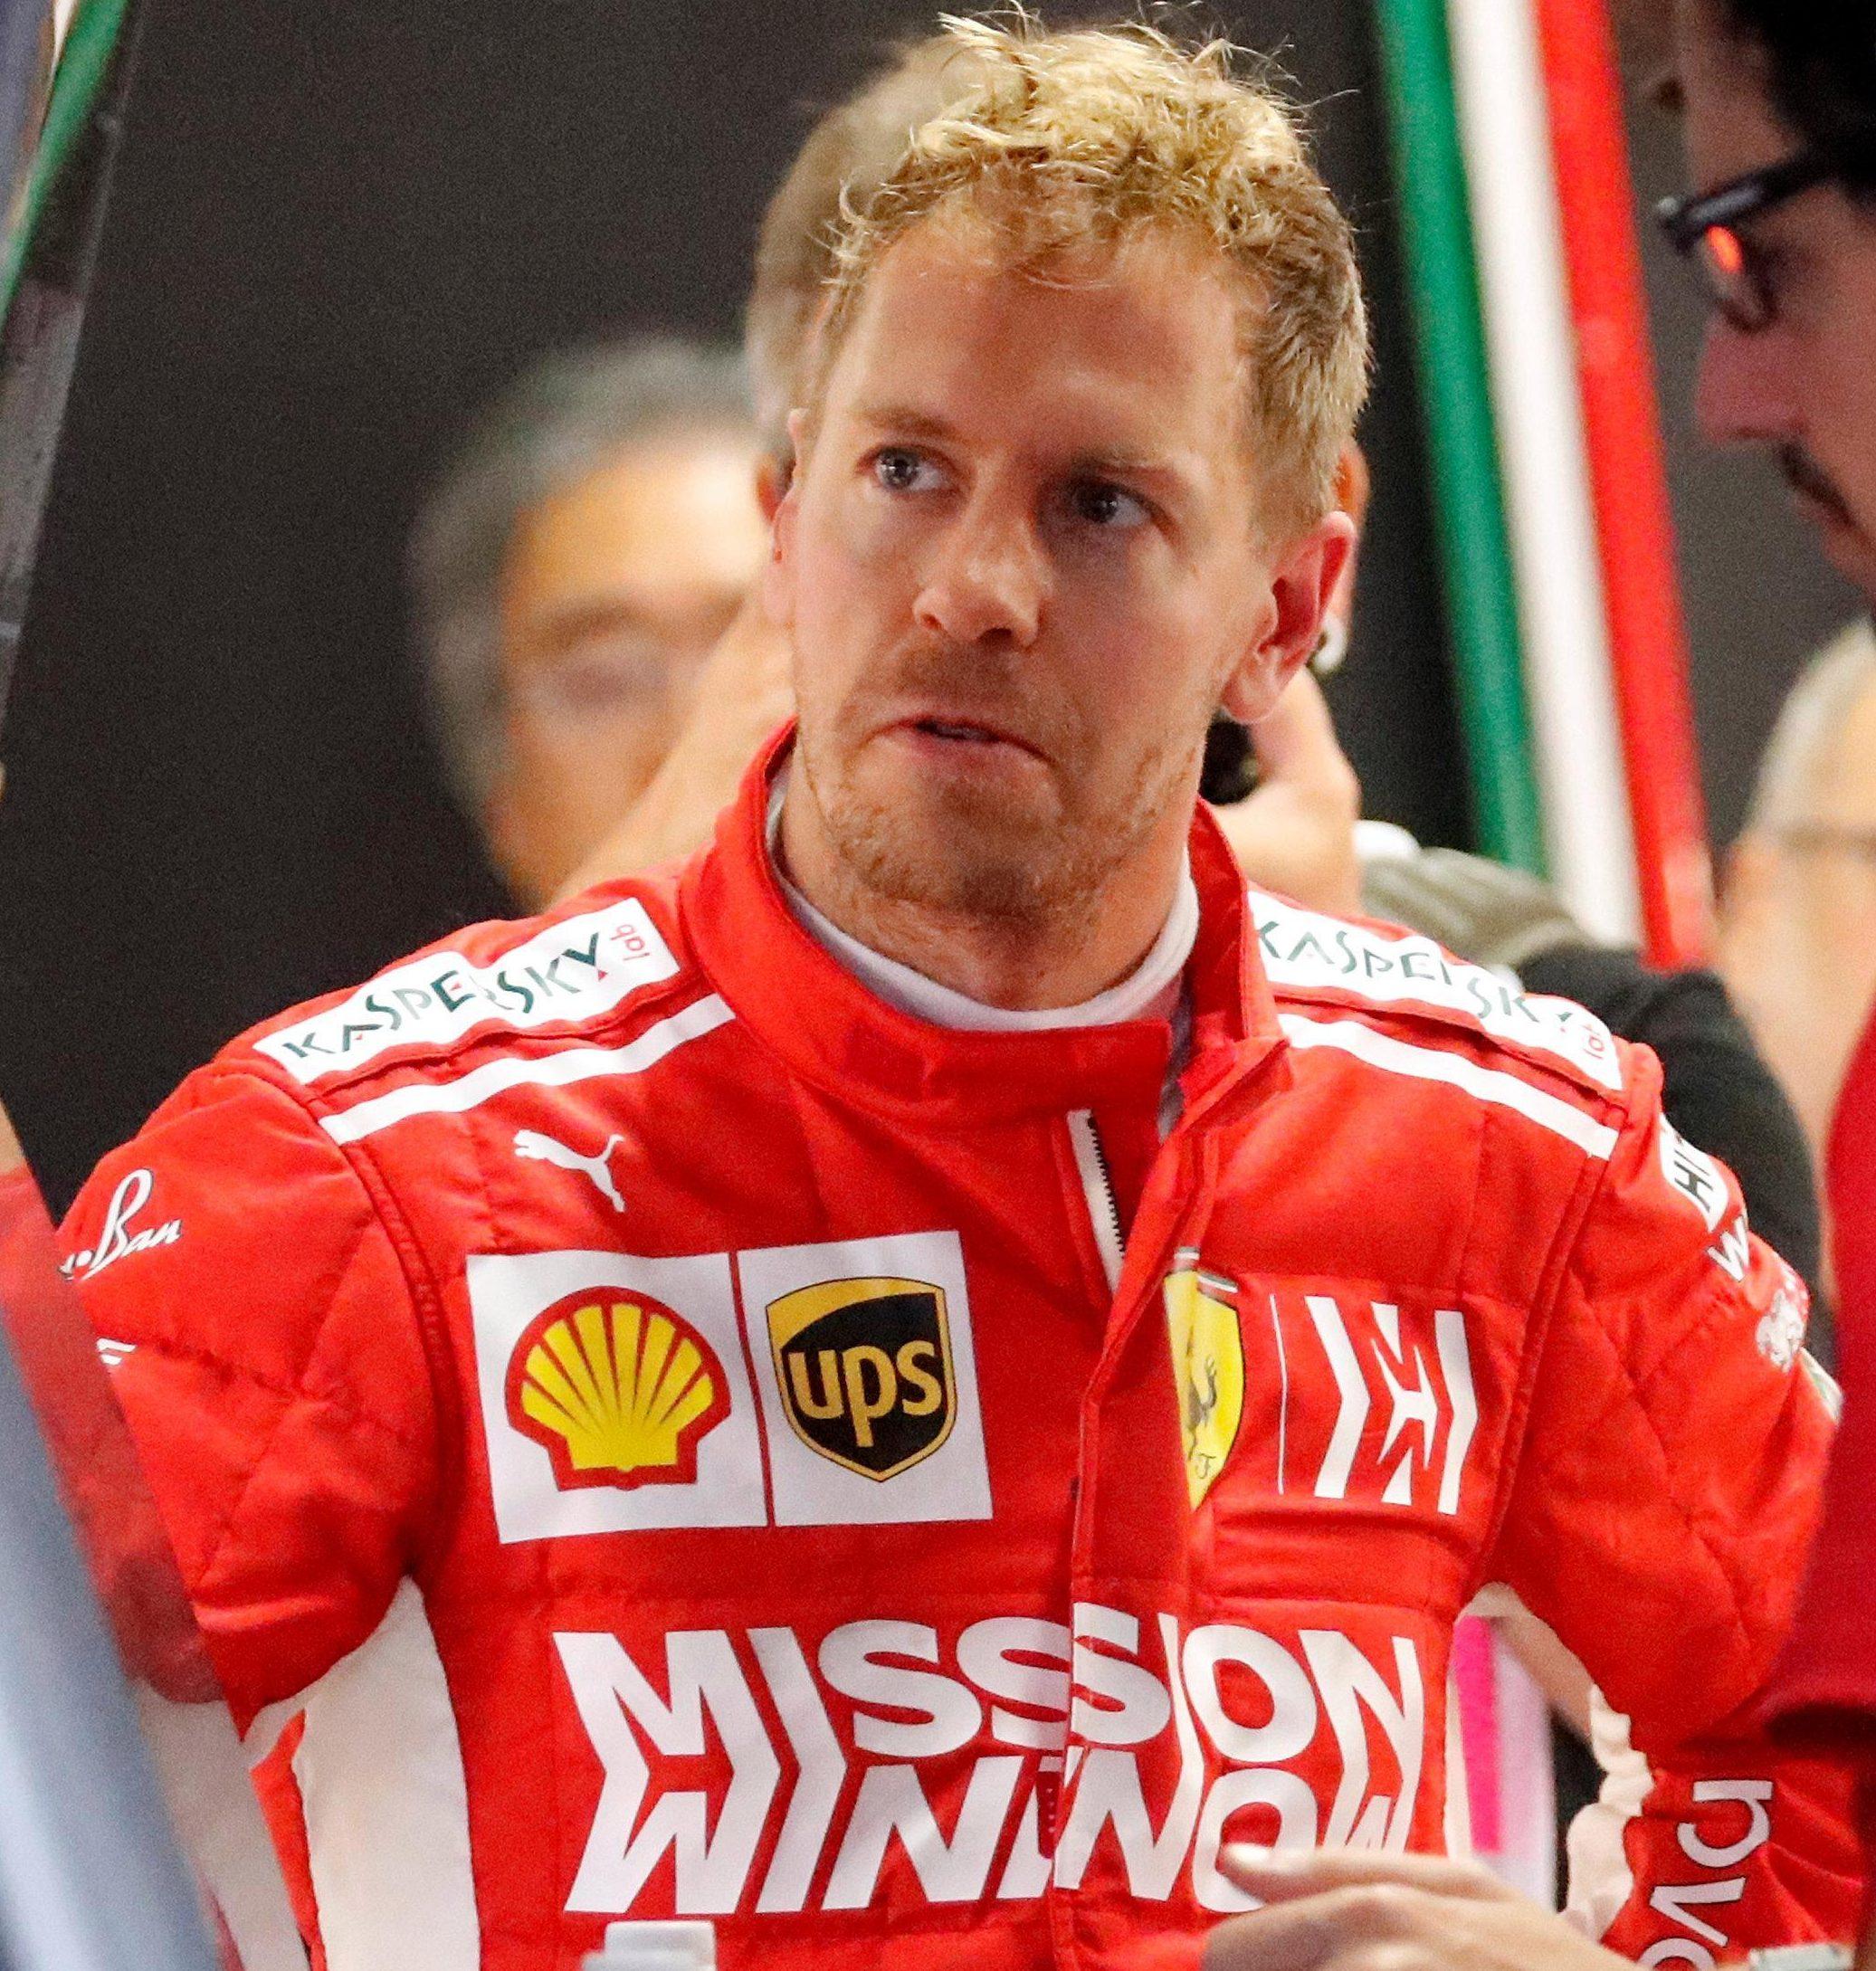 Sebastian Vettel has been slammed by ex-champ Jacques Villeneuve after big rival Lewis Hamilton took command of the F1 title race